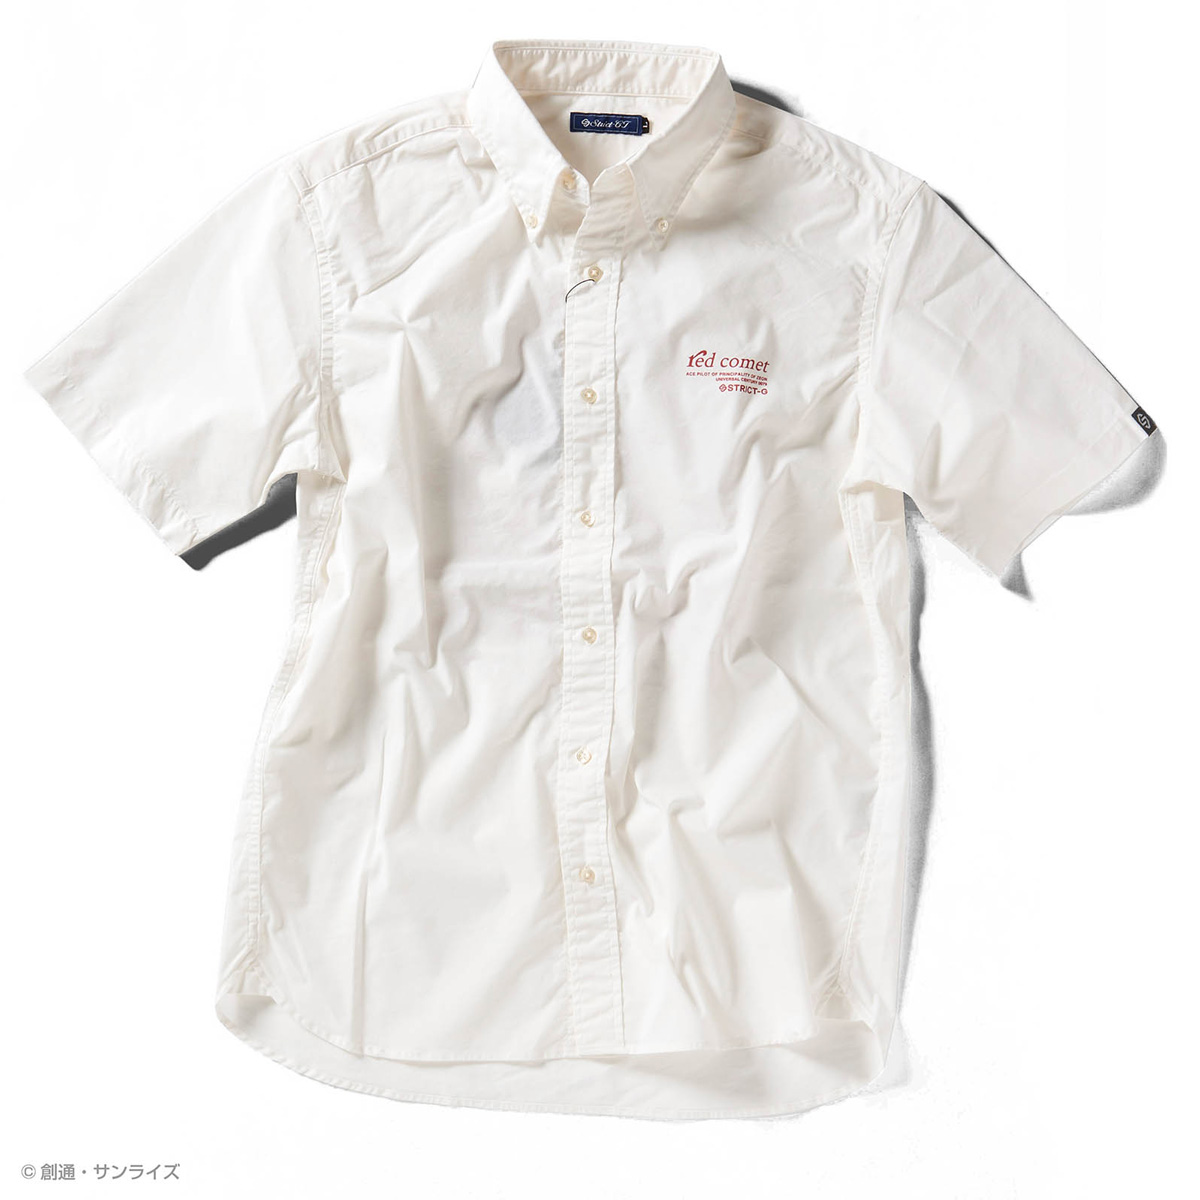 STRICT-G『機動戦士ガンダム』 クールマックス 半袖ボタンダウンPt.シャツ RED COMET